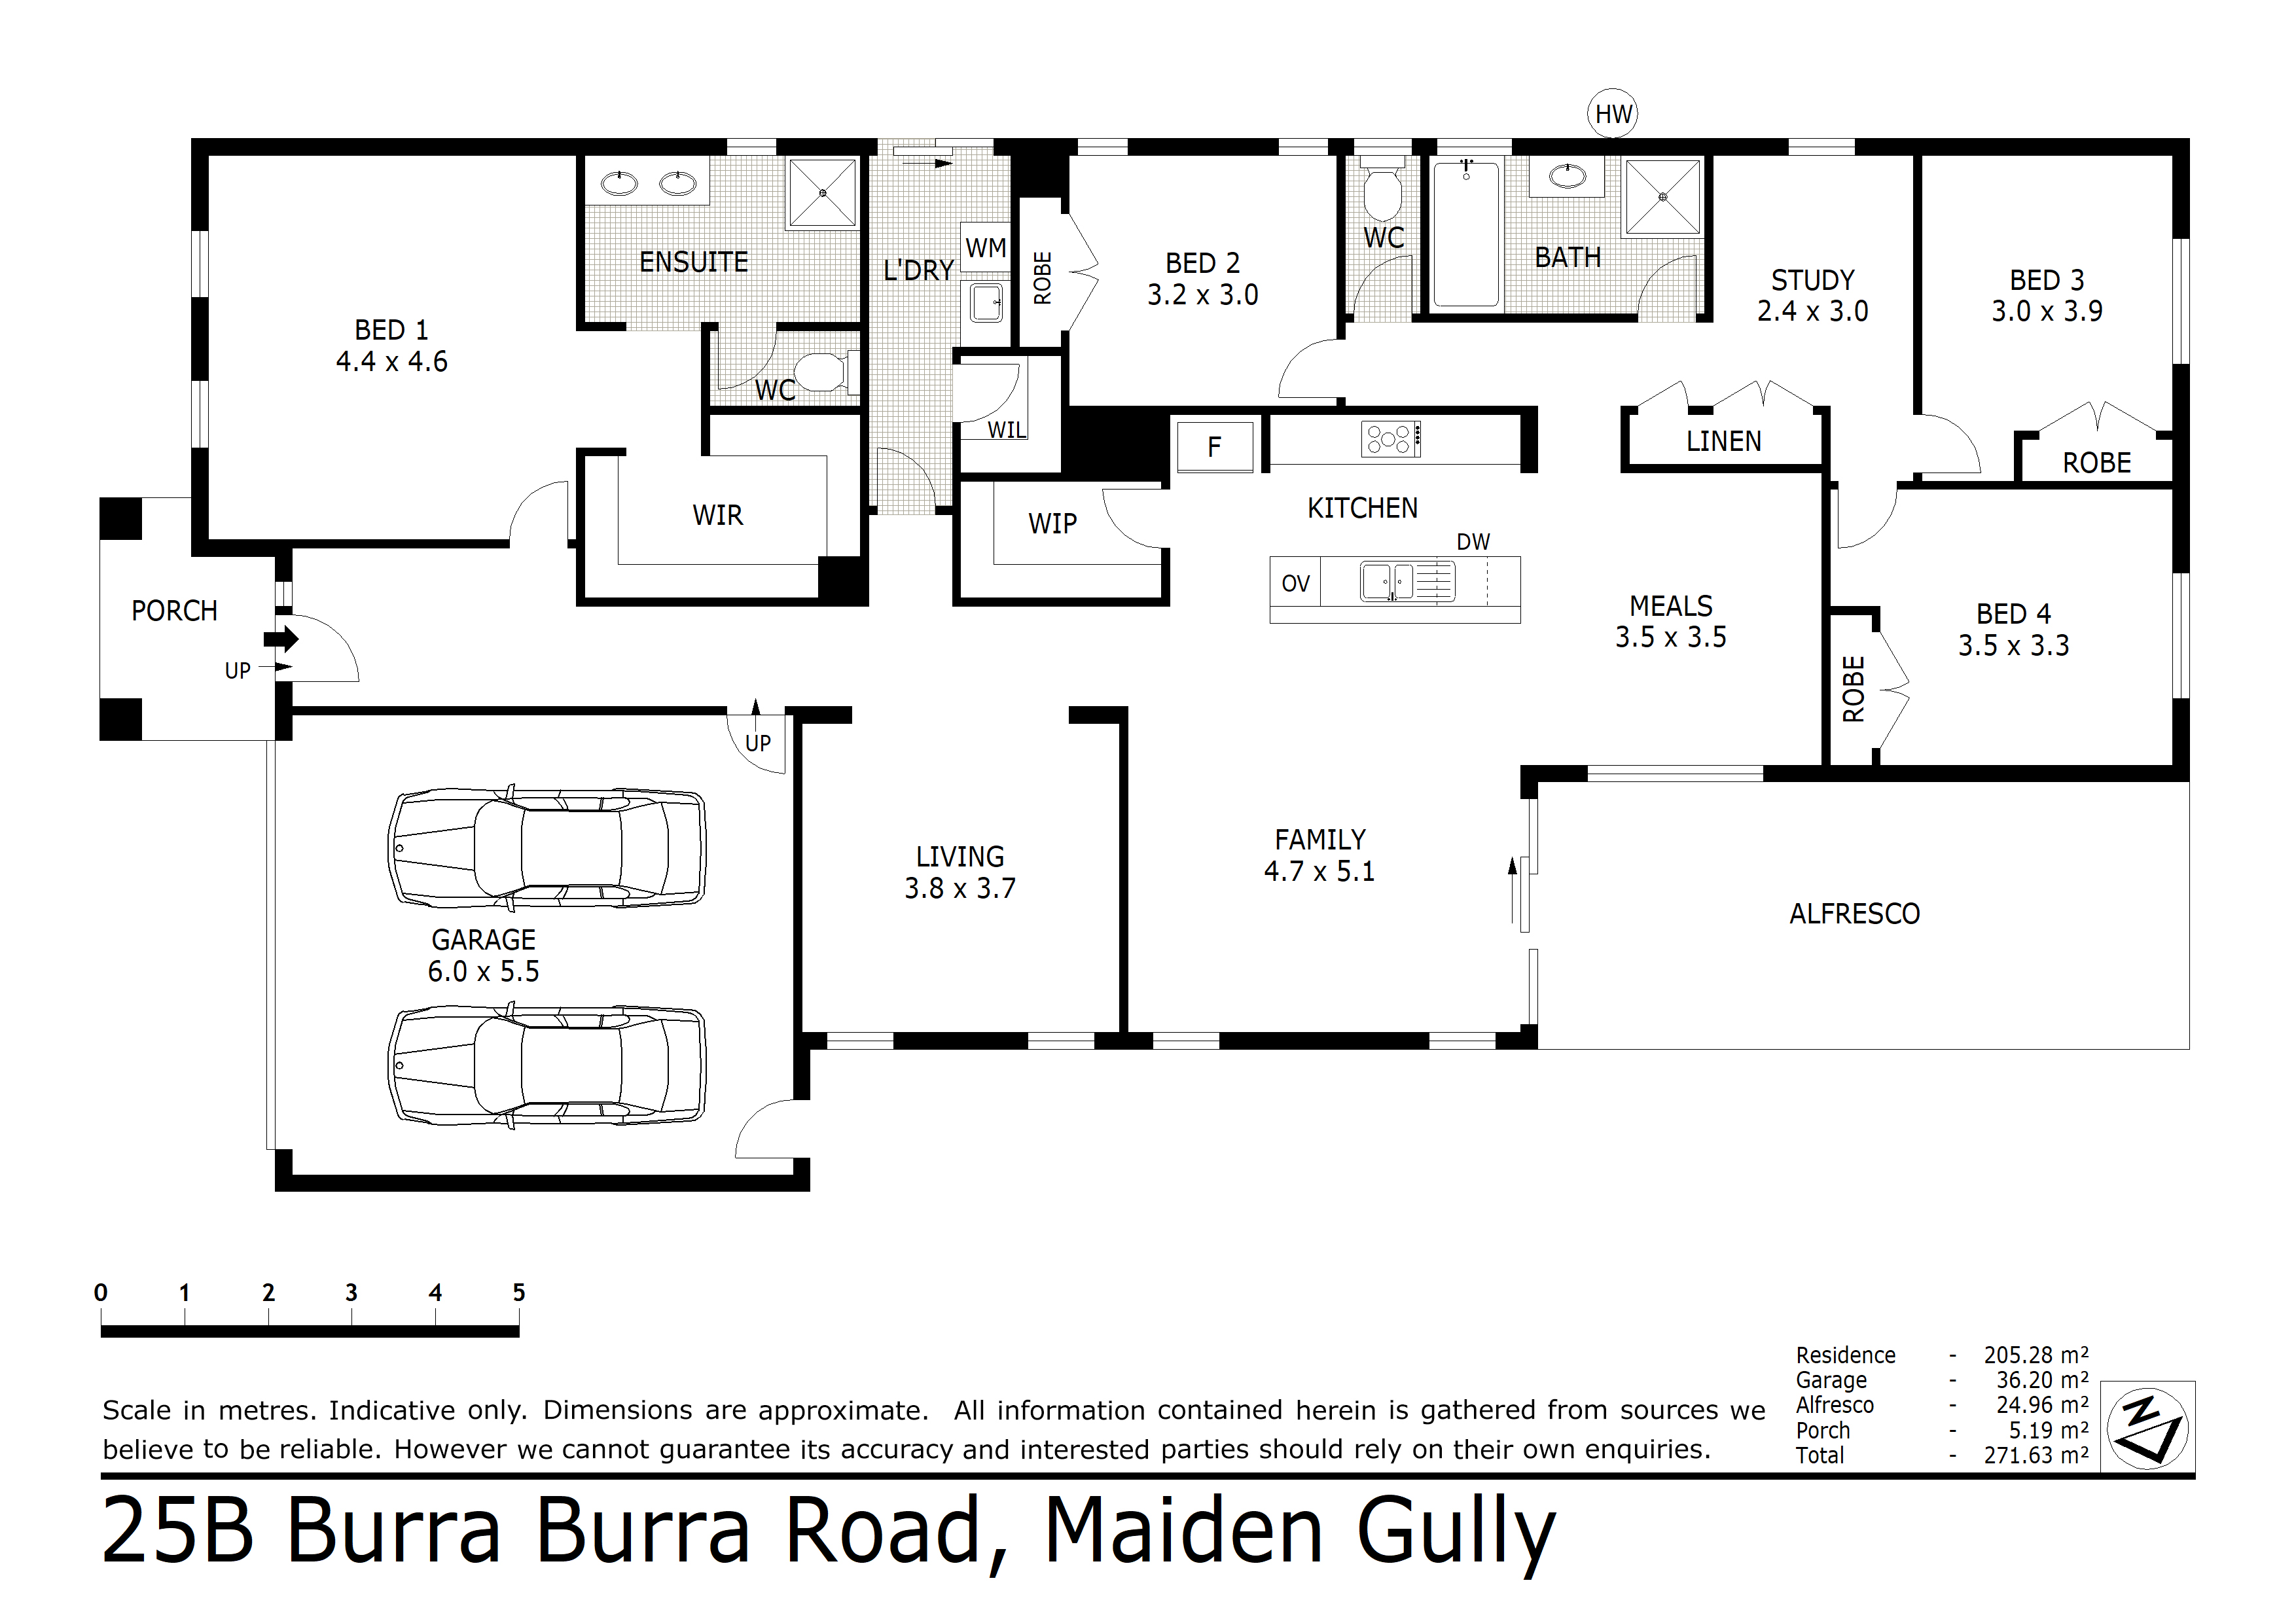 25B Burra Burra Road, Maiden Gully, VIC 3551